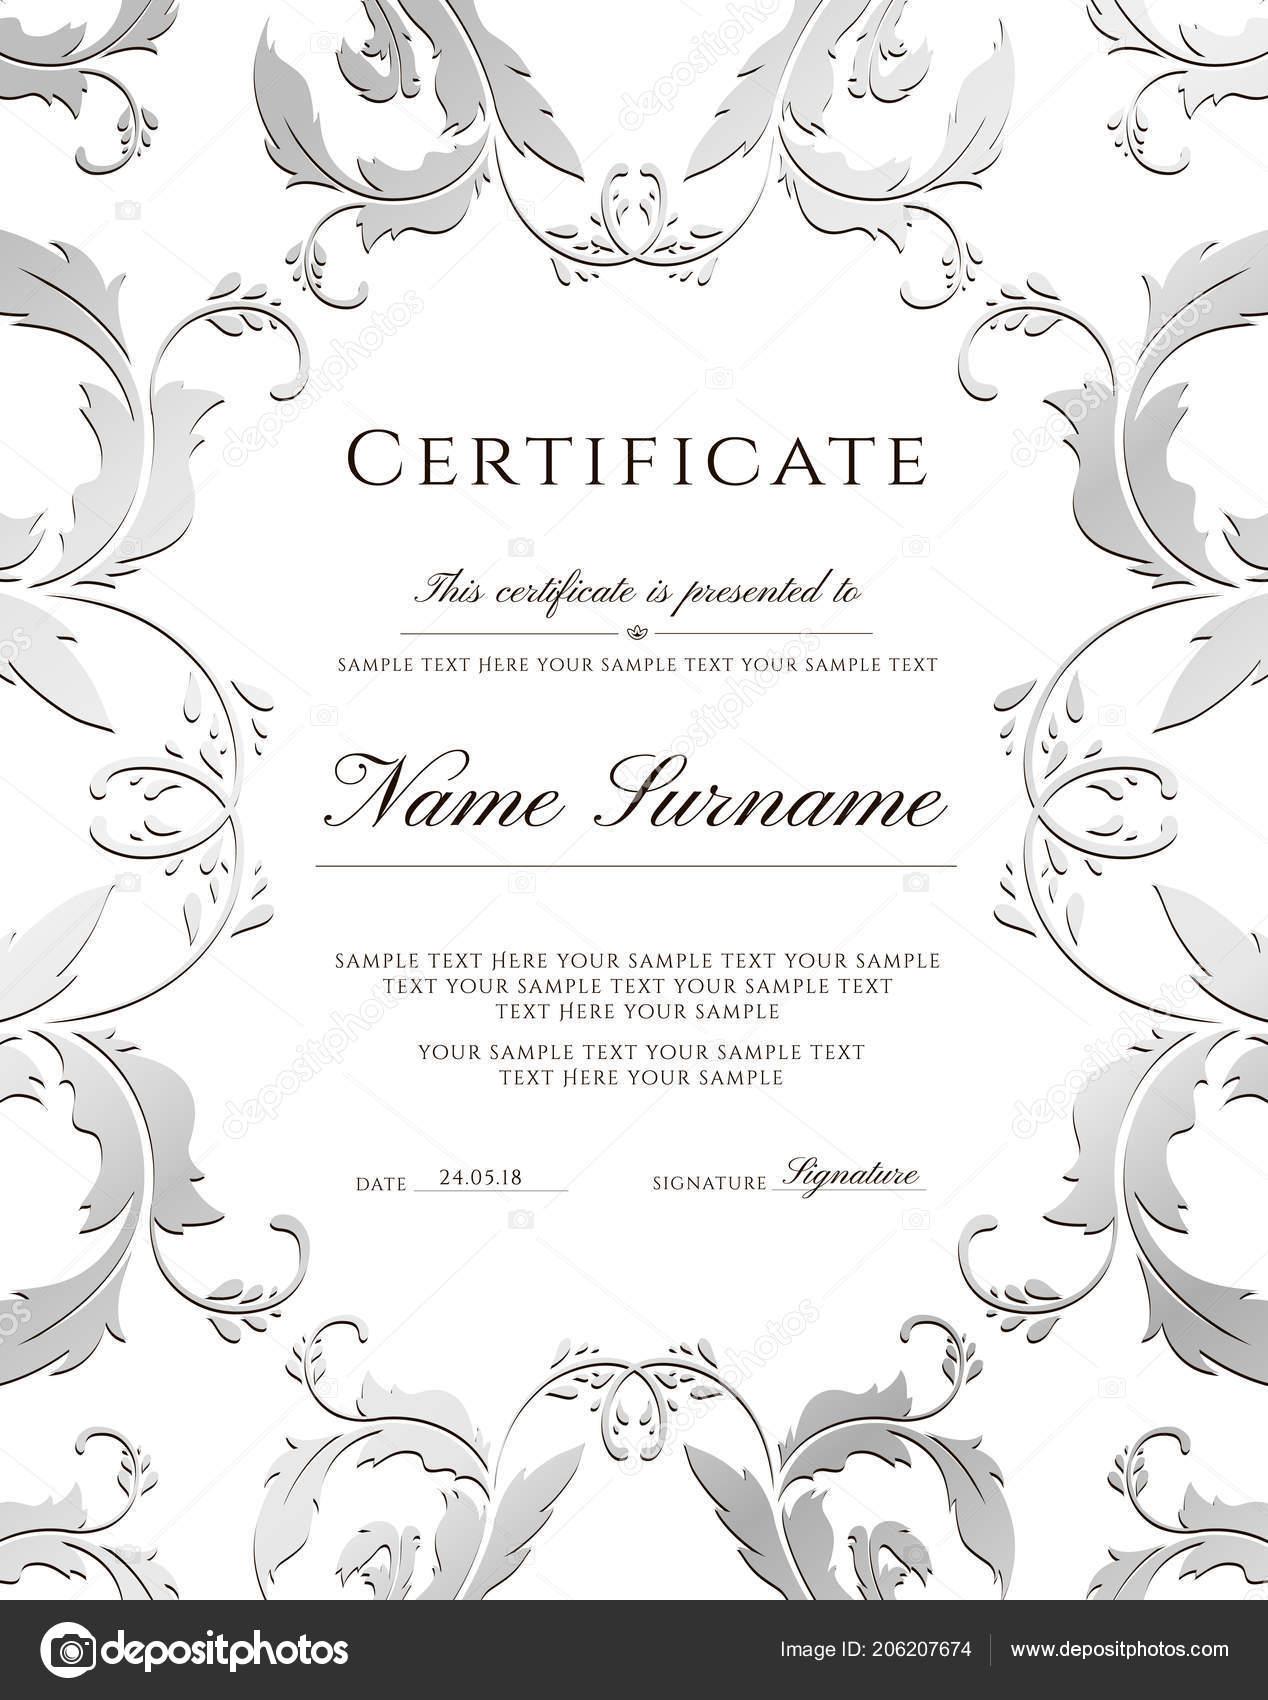 Certificate Template Silver Border Editable Design Diploma